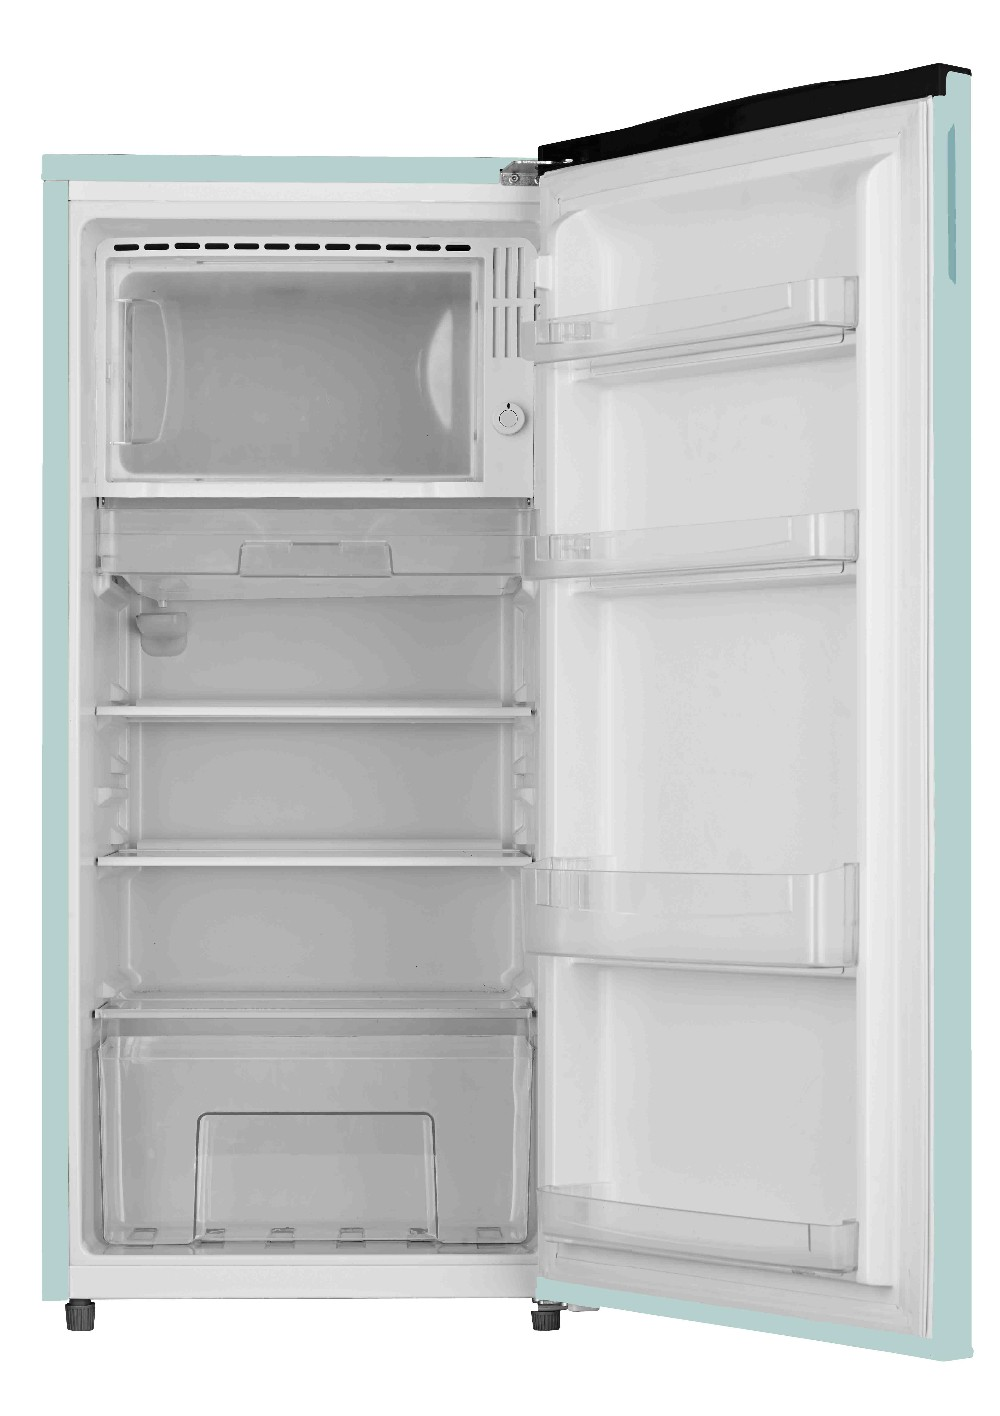 Retro Stil Kühlschrank Eintürig Kühlschrank/bunte Retro Kühlschrank ...